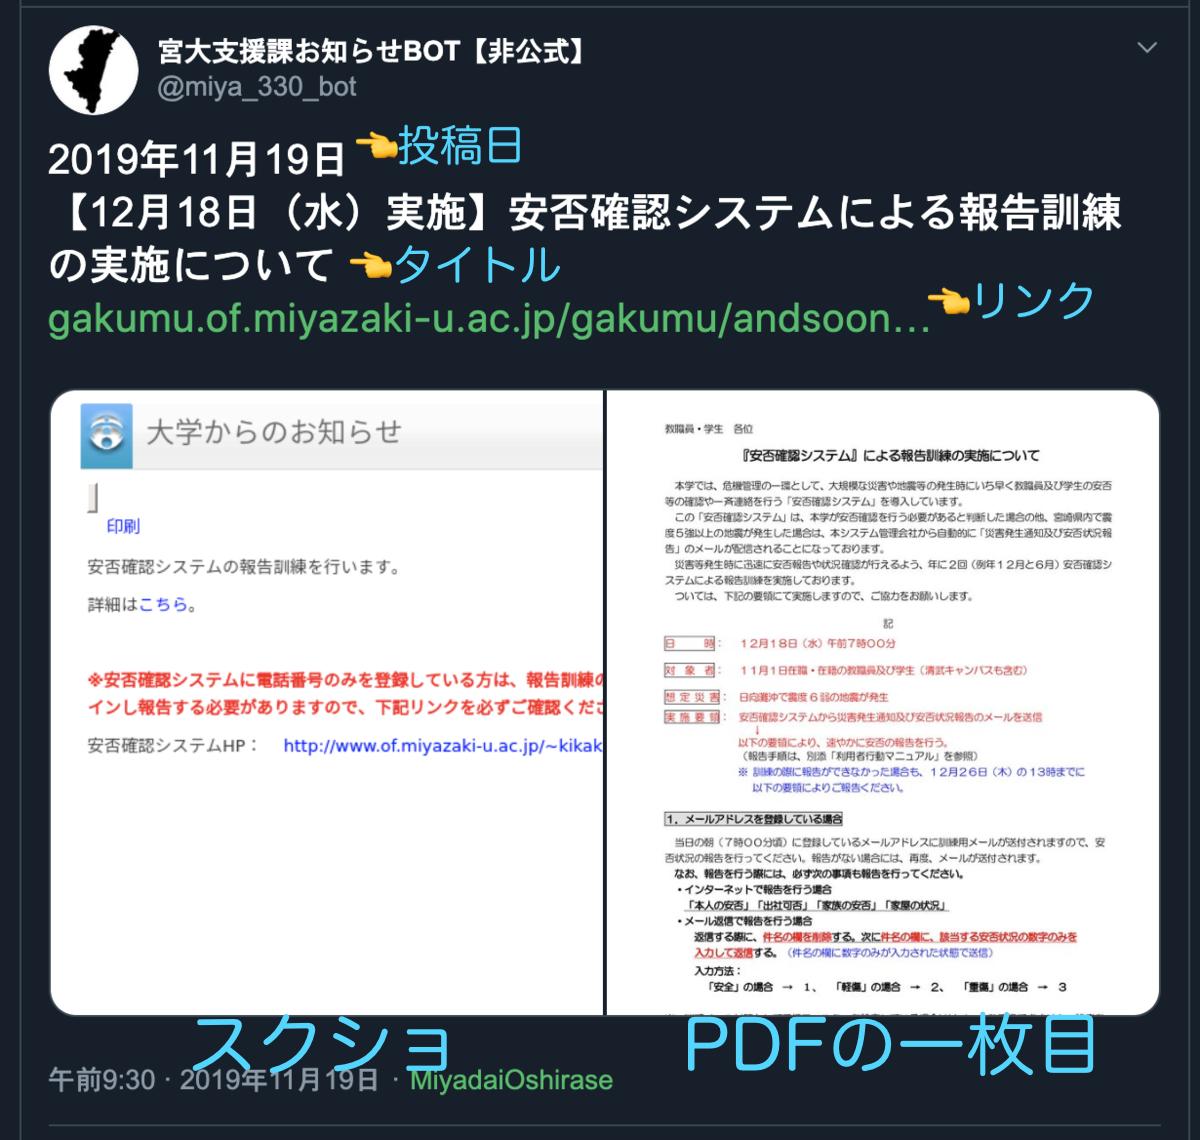 f:id:korosuke613:20191201234446p:plain